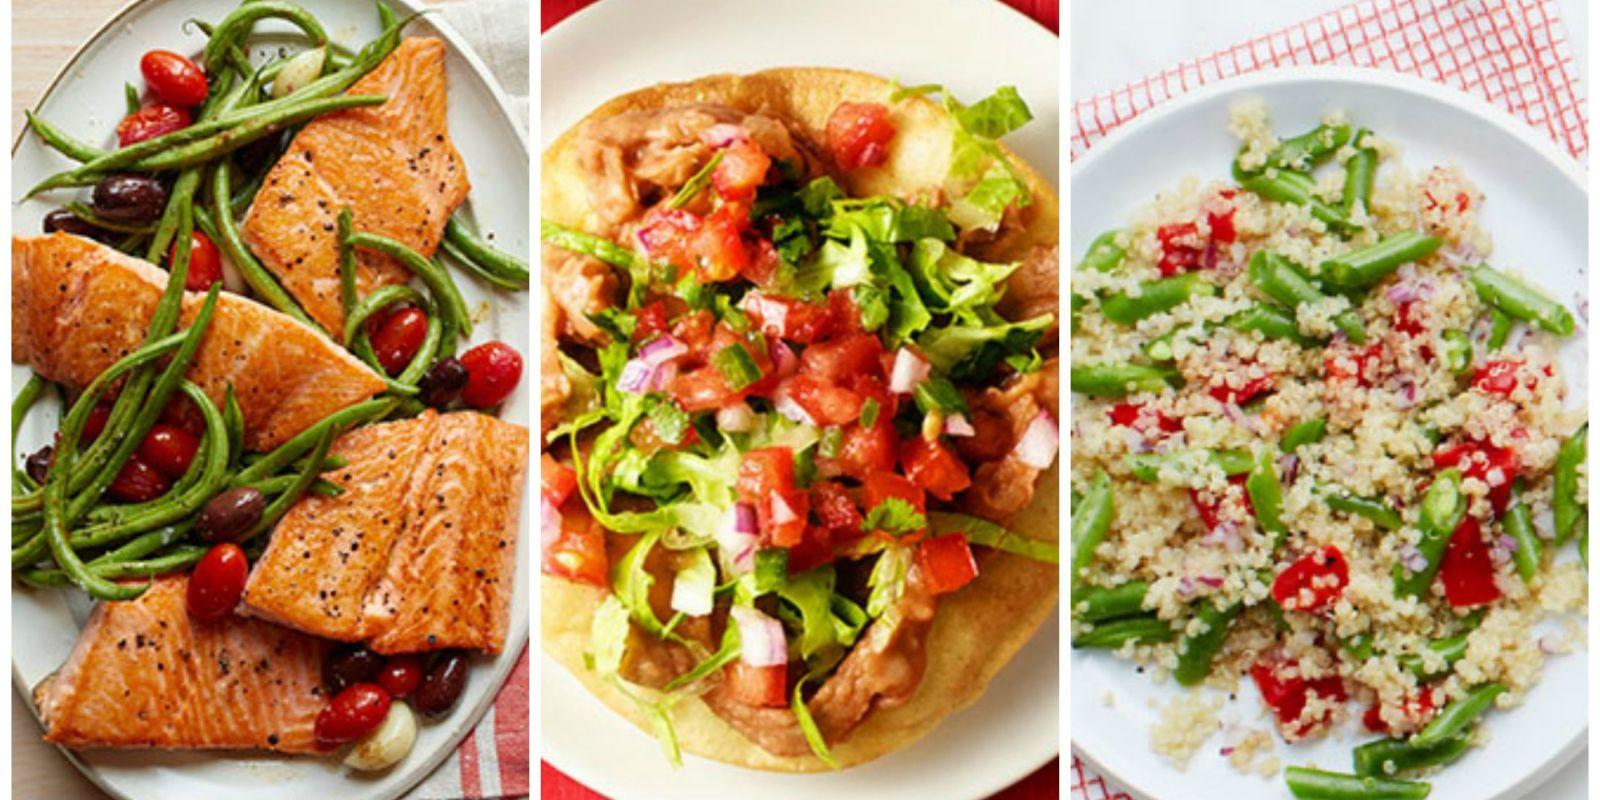 Healthy Dinner Recipes Easy  15 Easy Heart Healthy Recipes Quick Heart Healthy Meals